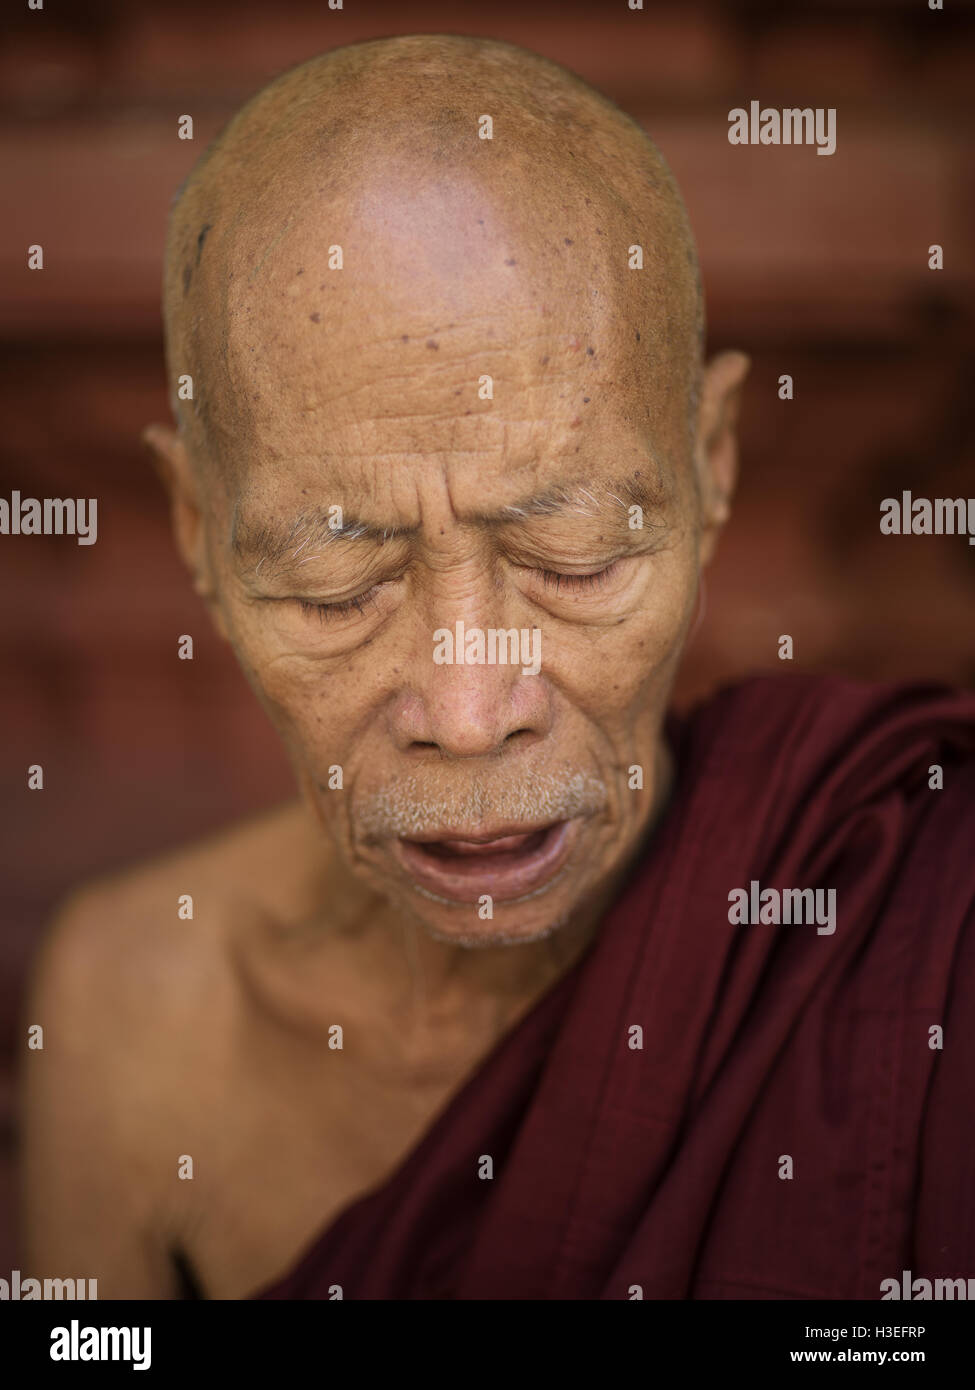 Un moine bouddhiste prie à Yangon, Myanmar (Birmanie) Photo Stock